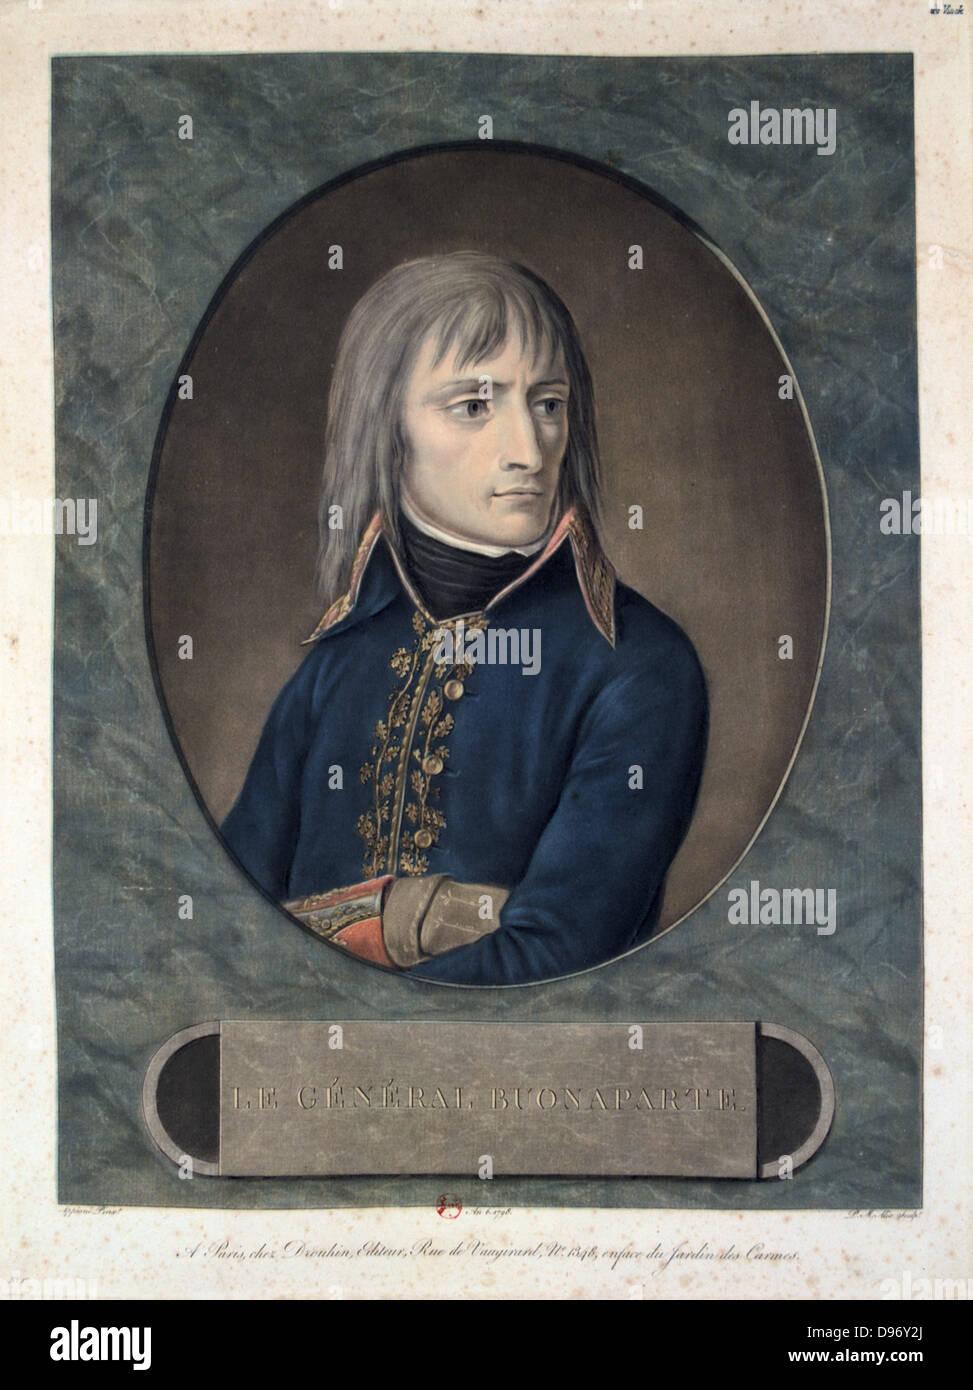 General Bonaparte (1769-1821). Aquatint published 1796. - Stock Image